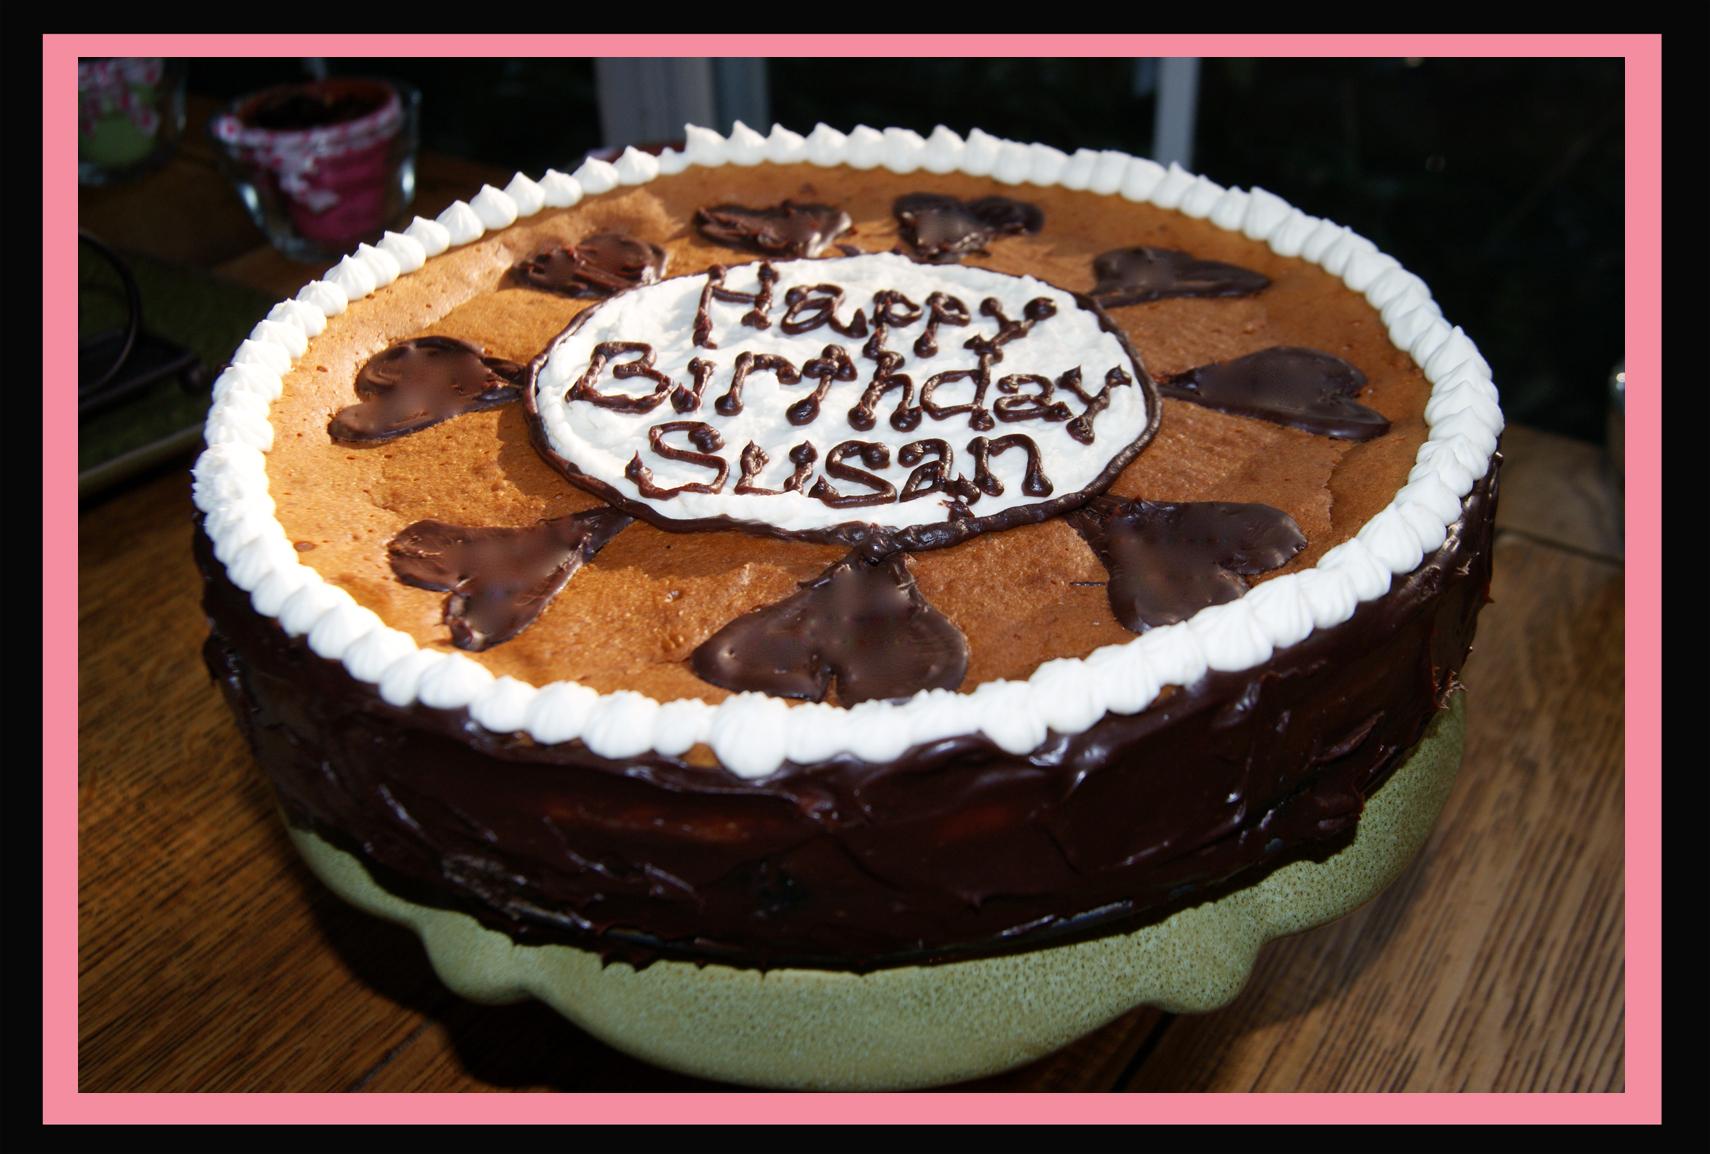 Susan s Triple Decker Cheesecake